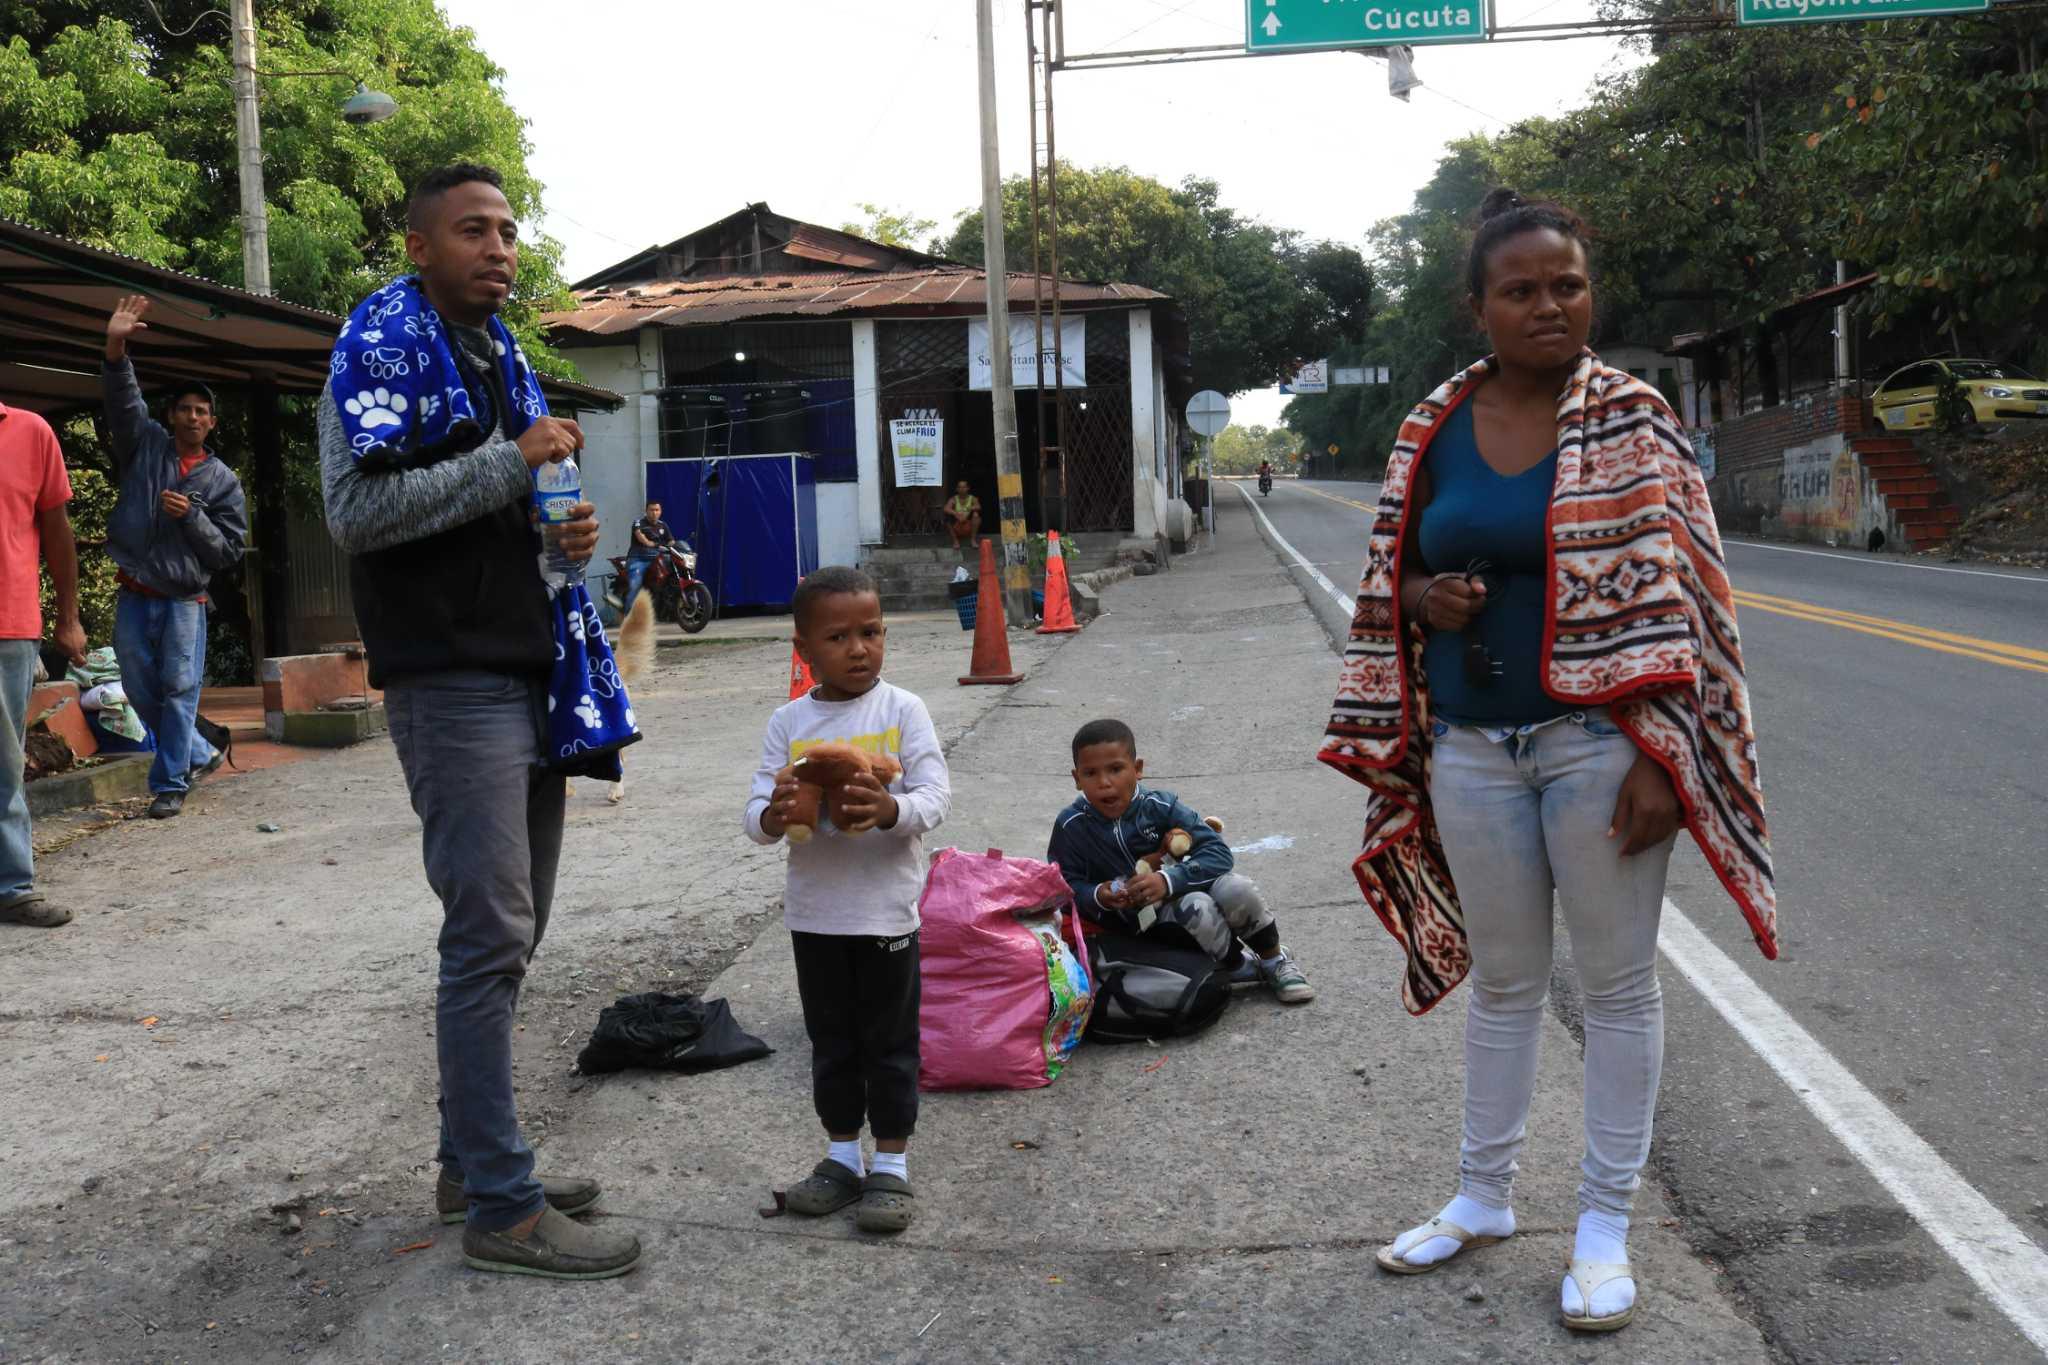 Houston philanthropist hopes to make headway in crisis-stricken homeland of Venezuela